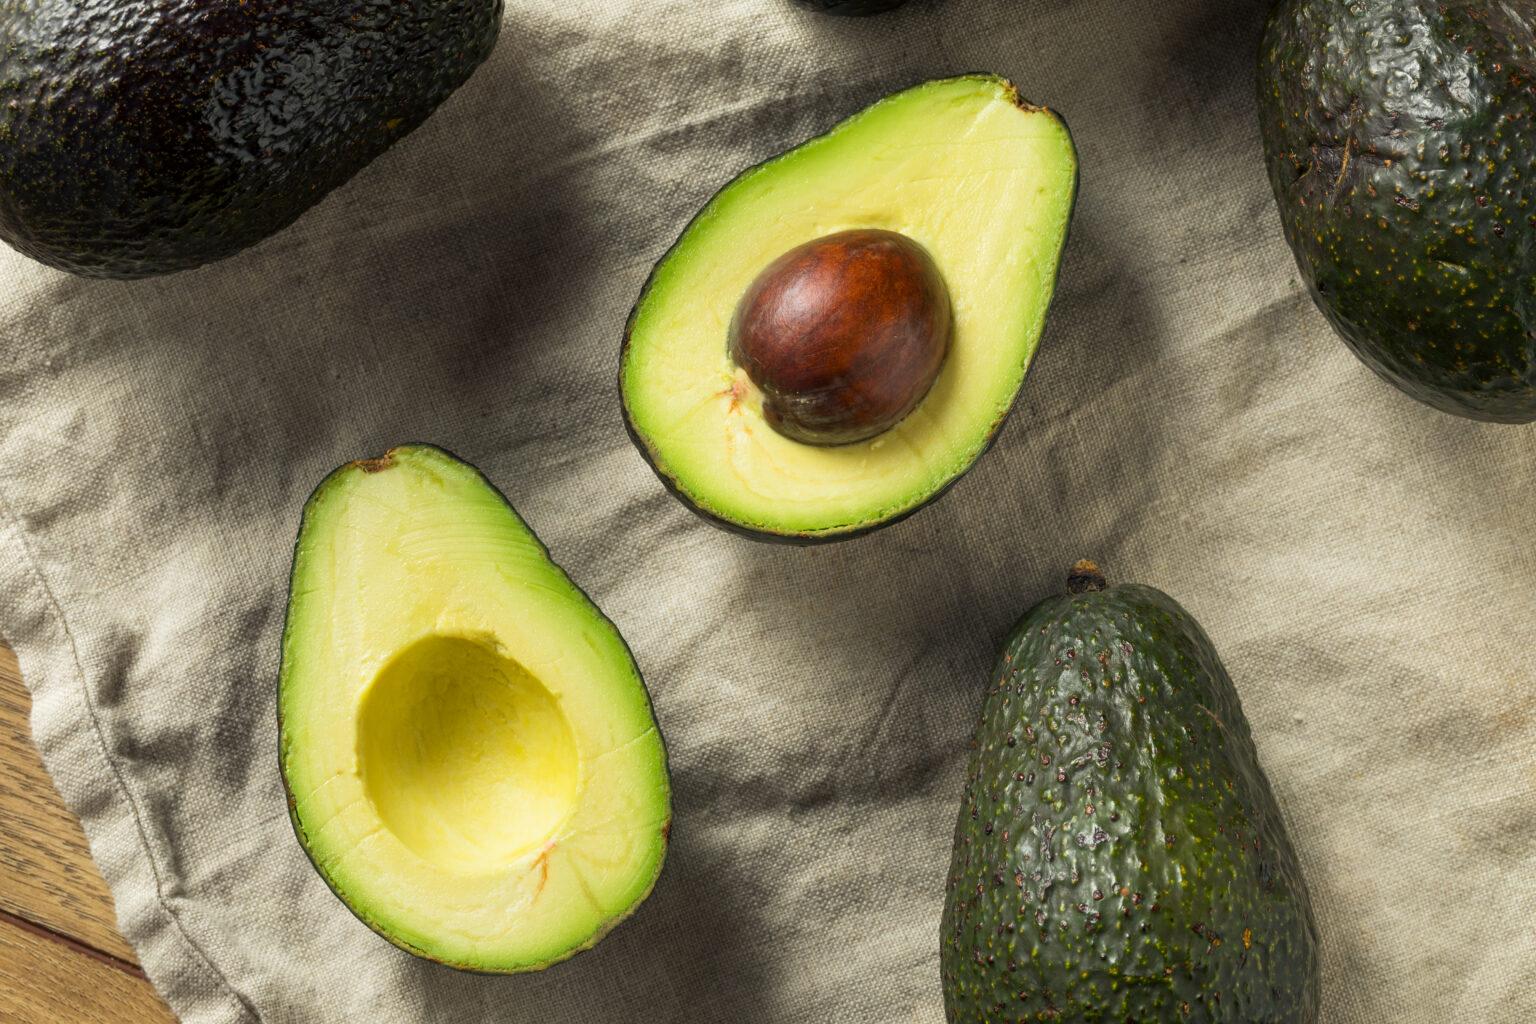 Raw Organic Green Avocados Ready to Cut Open